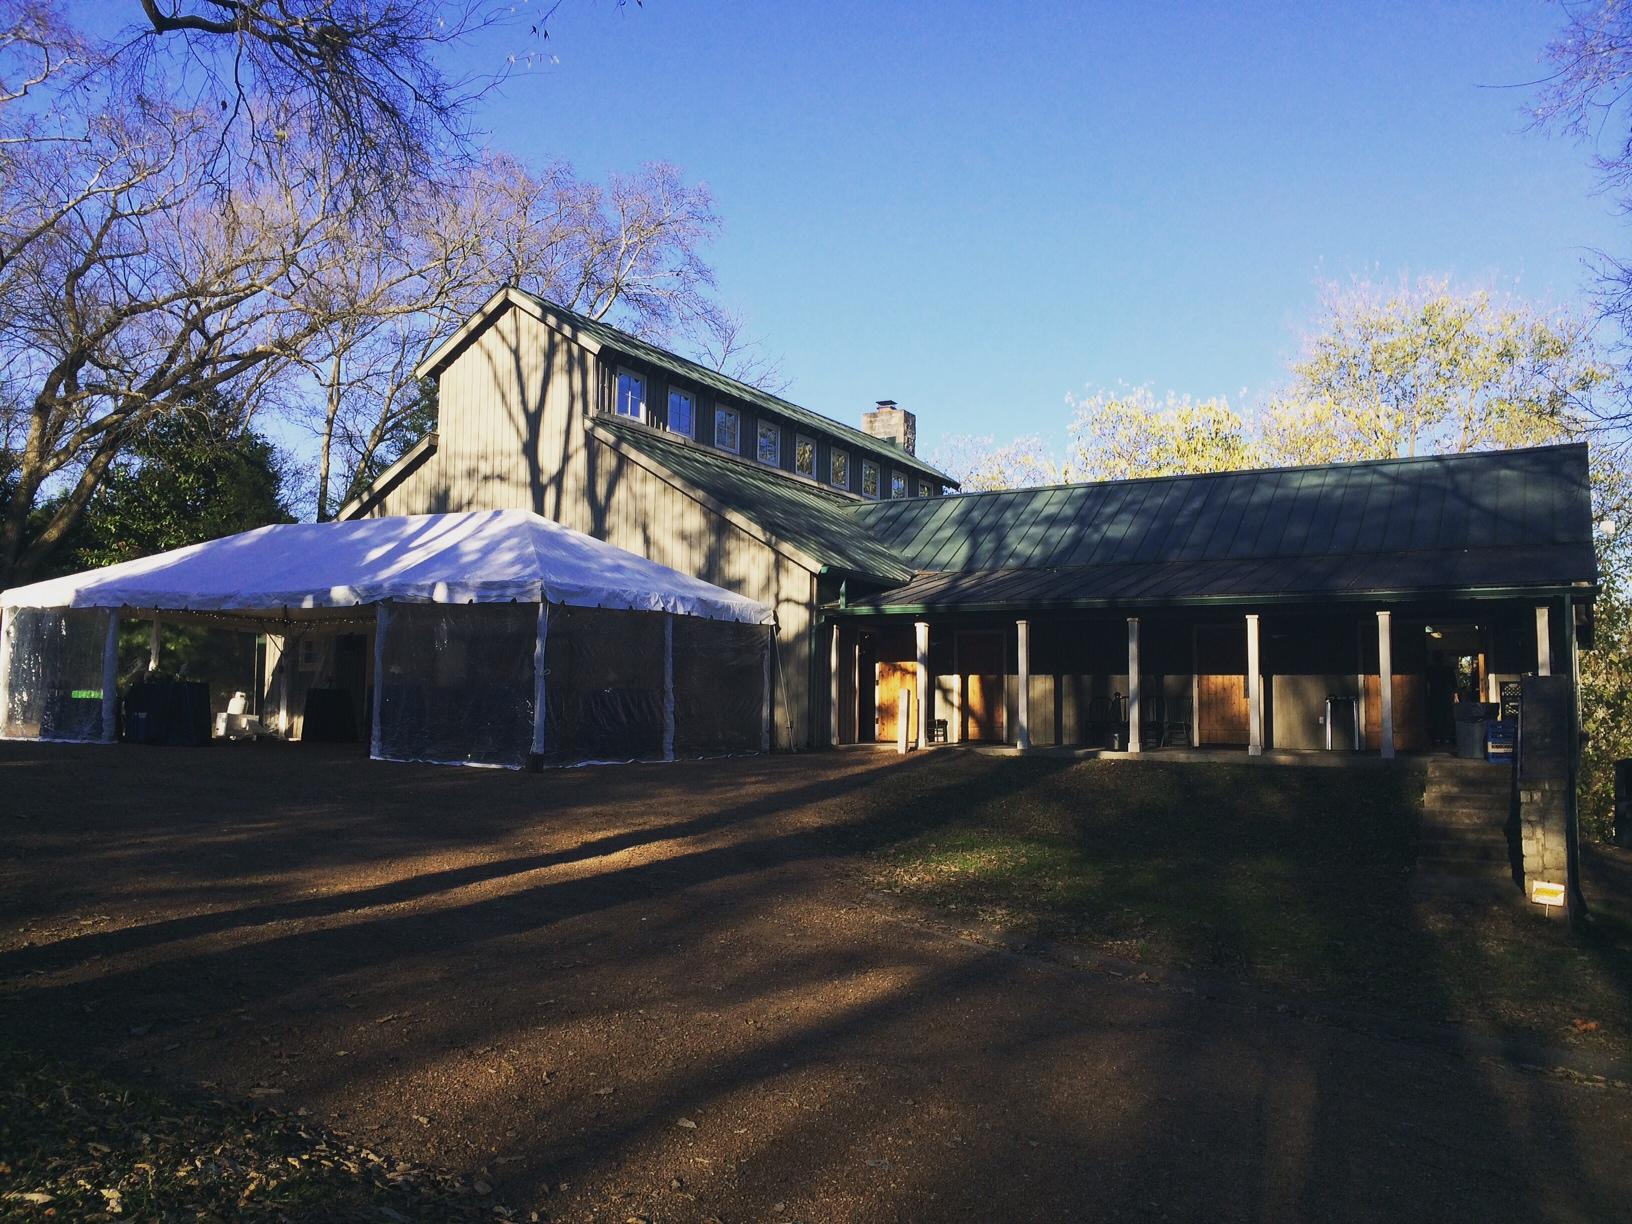 Tennessee Barn Wedding anyone?